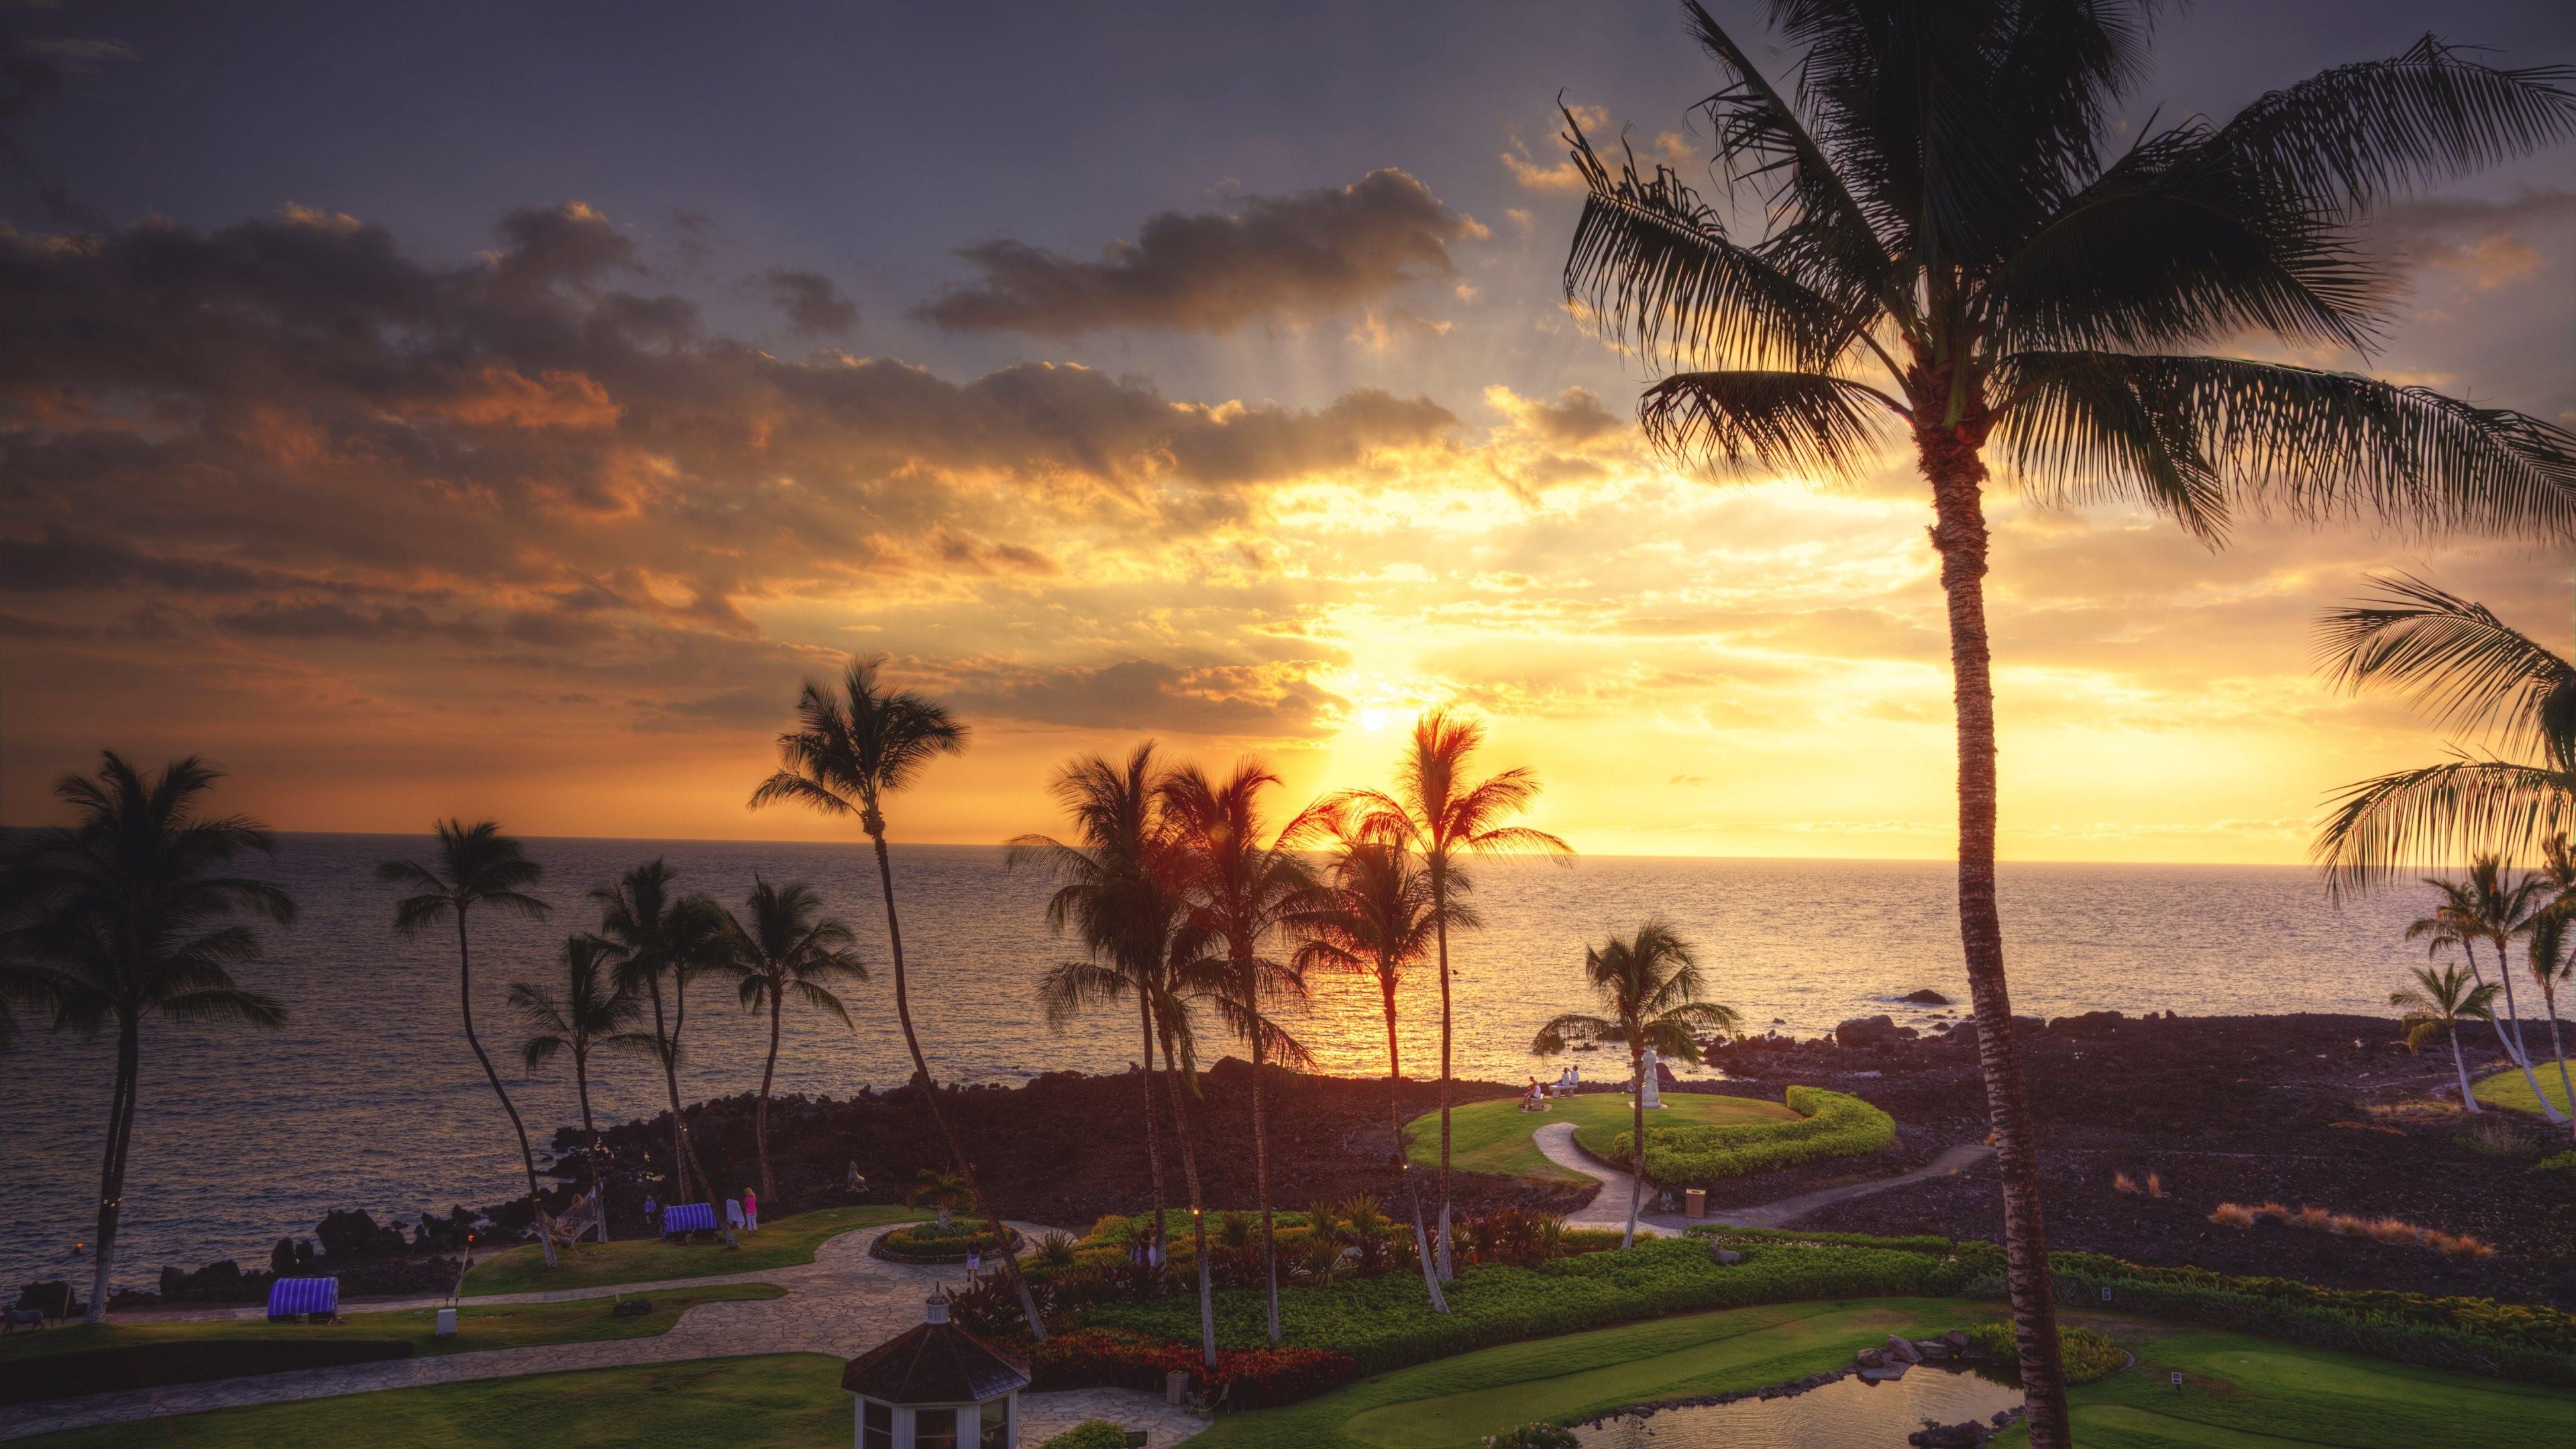 Wallpaper: Sunset from Hawaiian Resort. Ultra HD 4K 3840×2160